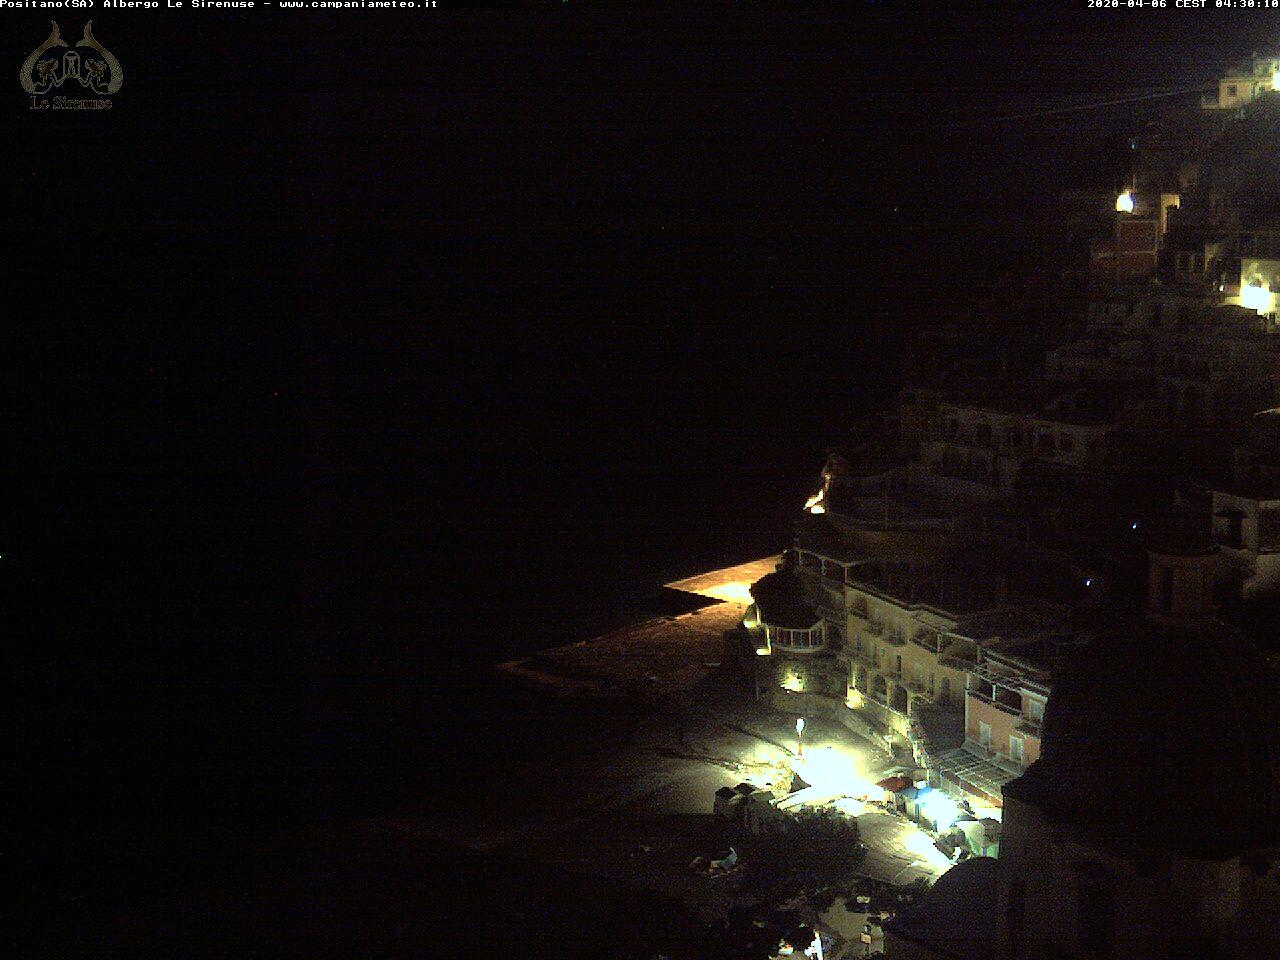 Webcam Positano, di Hotel Sirenuse